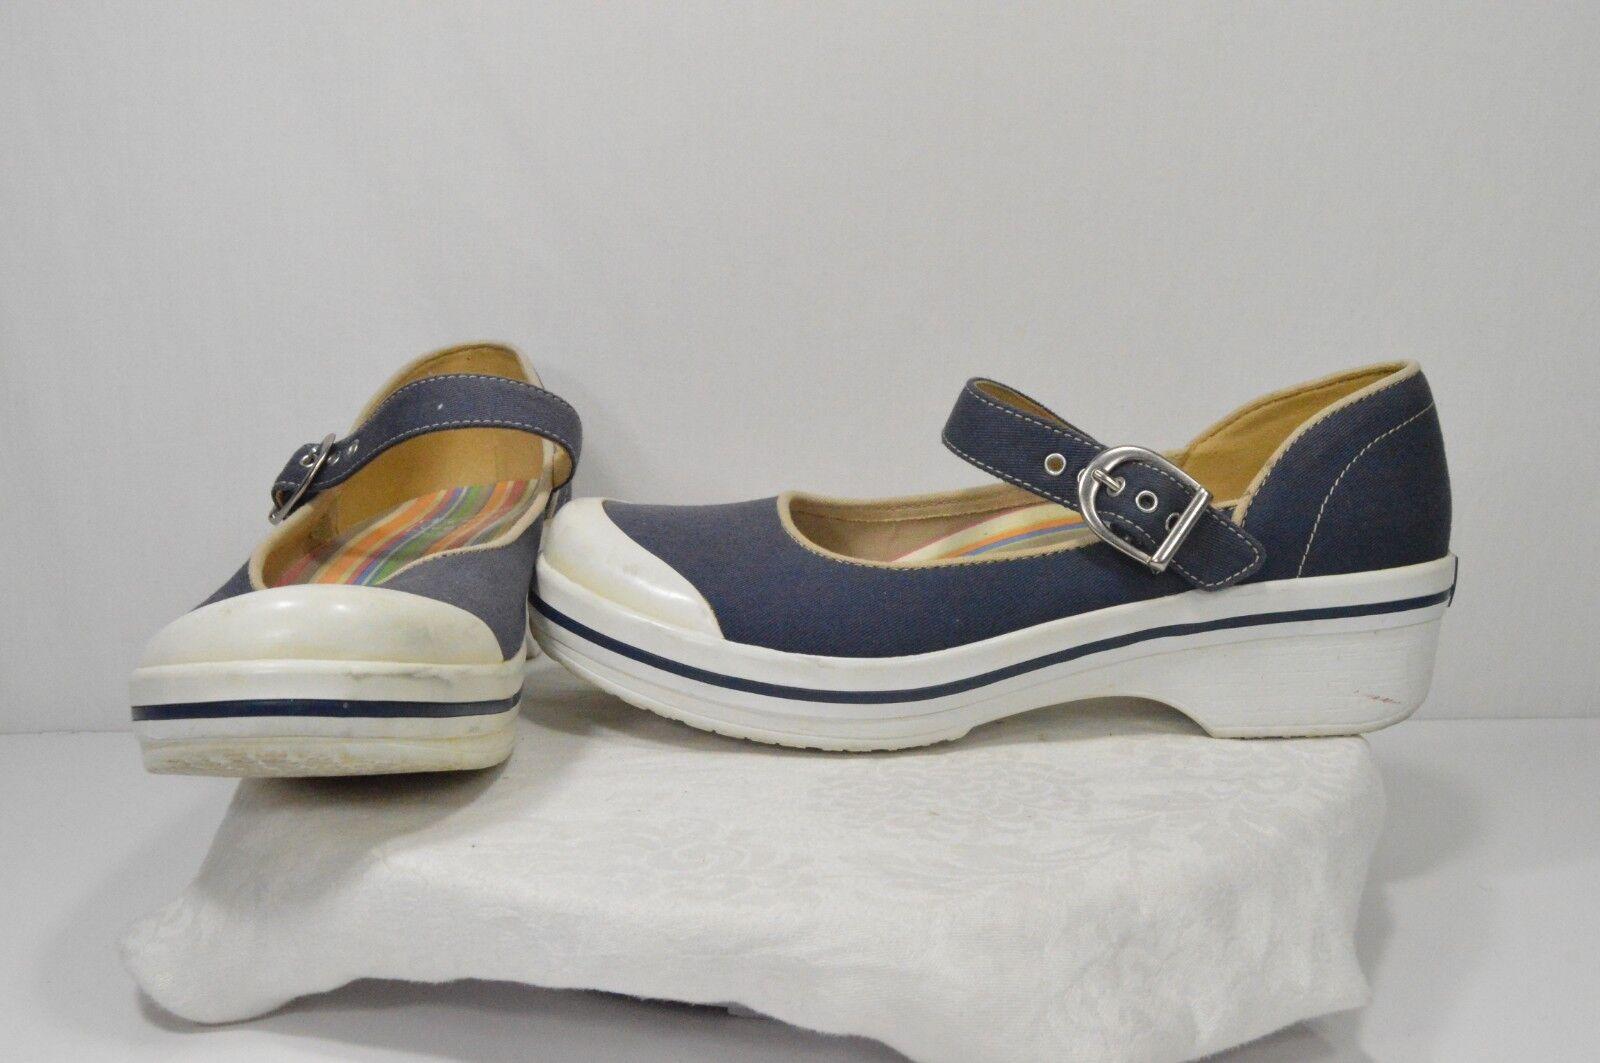 Dansko Summer Blau Canvas Strappy Casual Comfort Wedge Fashion Summer Dansko Heels Größe 8 fa1048